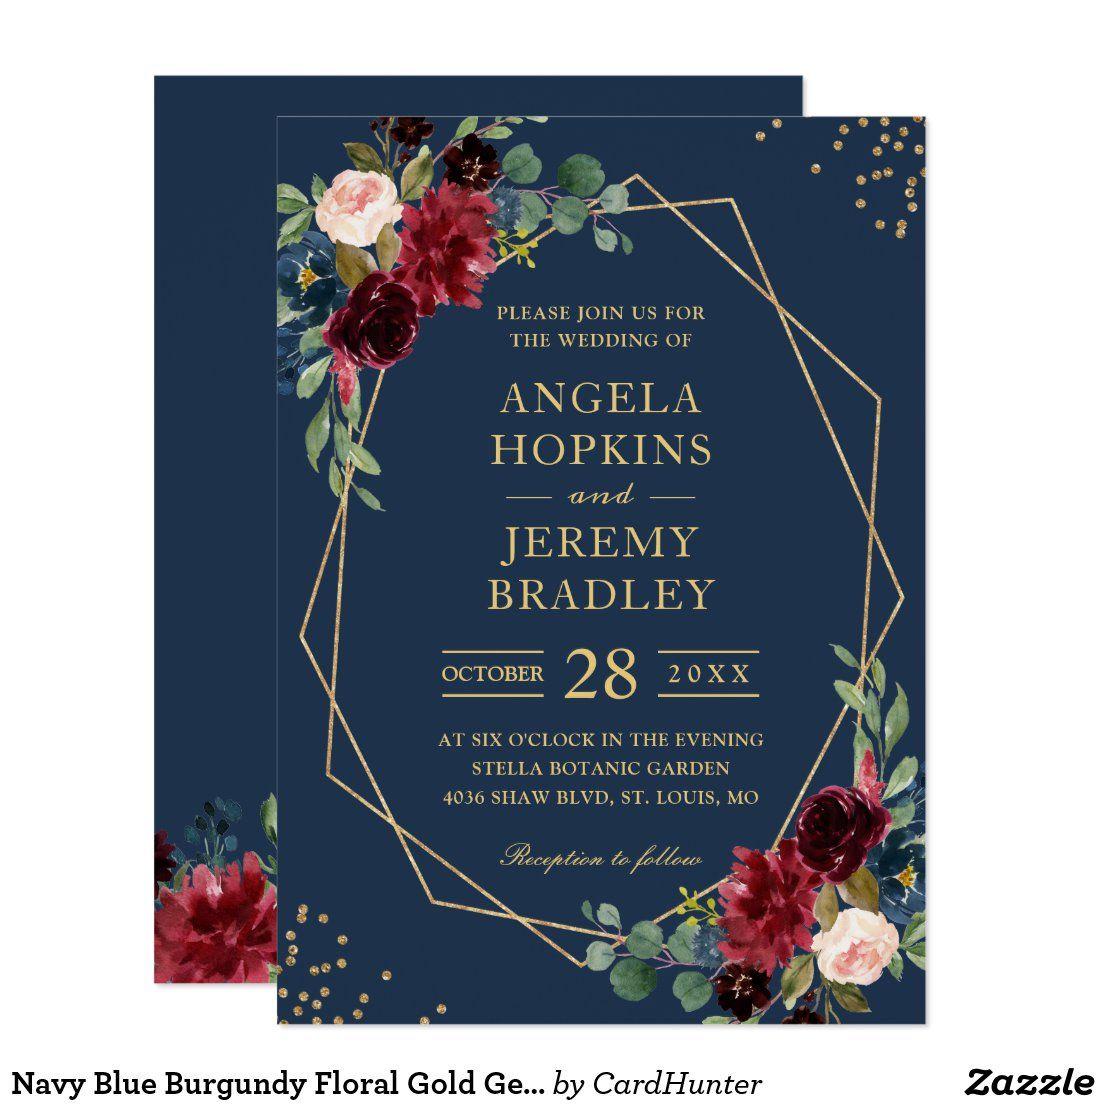 Navy Blue Burgundy Floral Gold Geometric Wedding